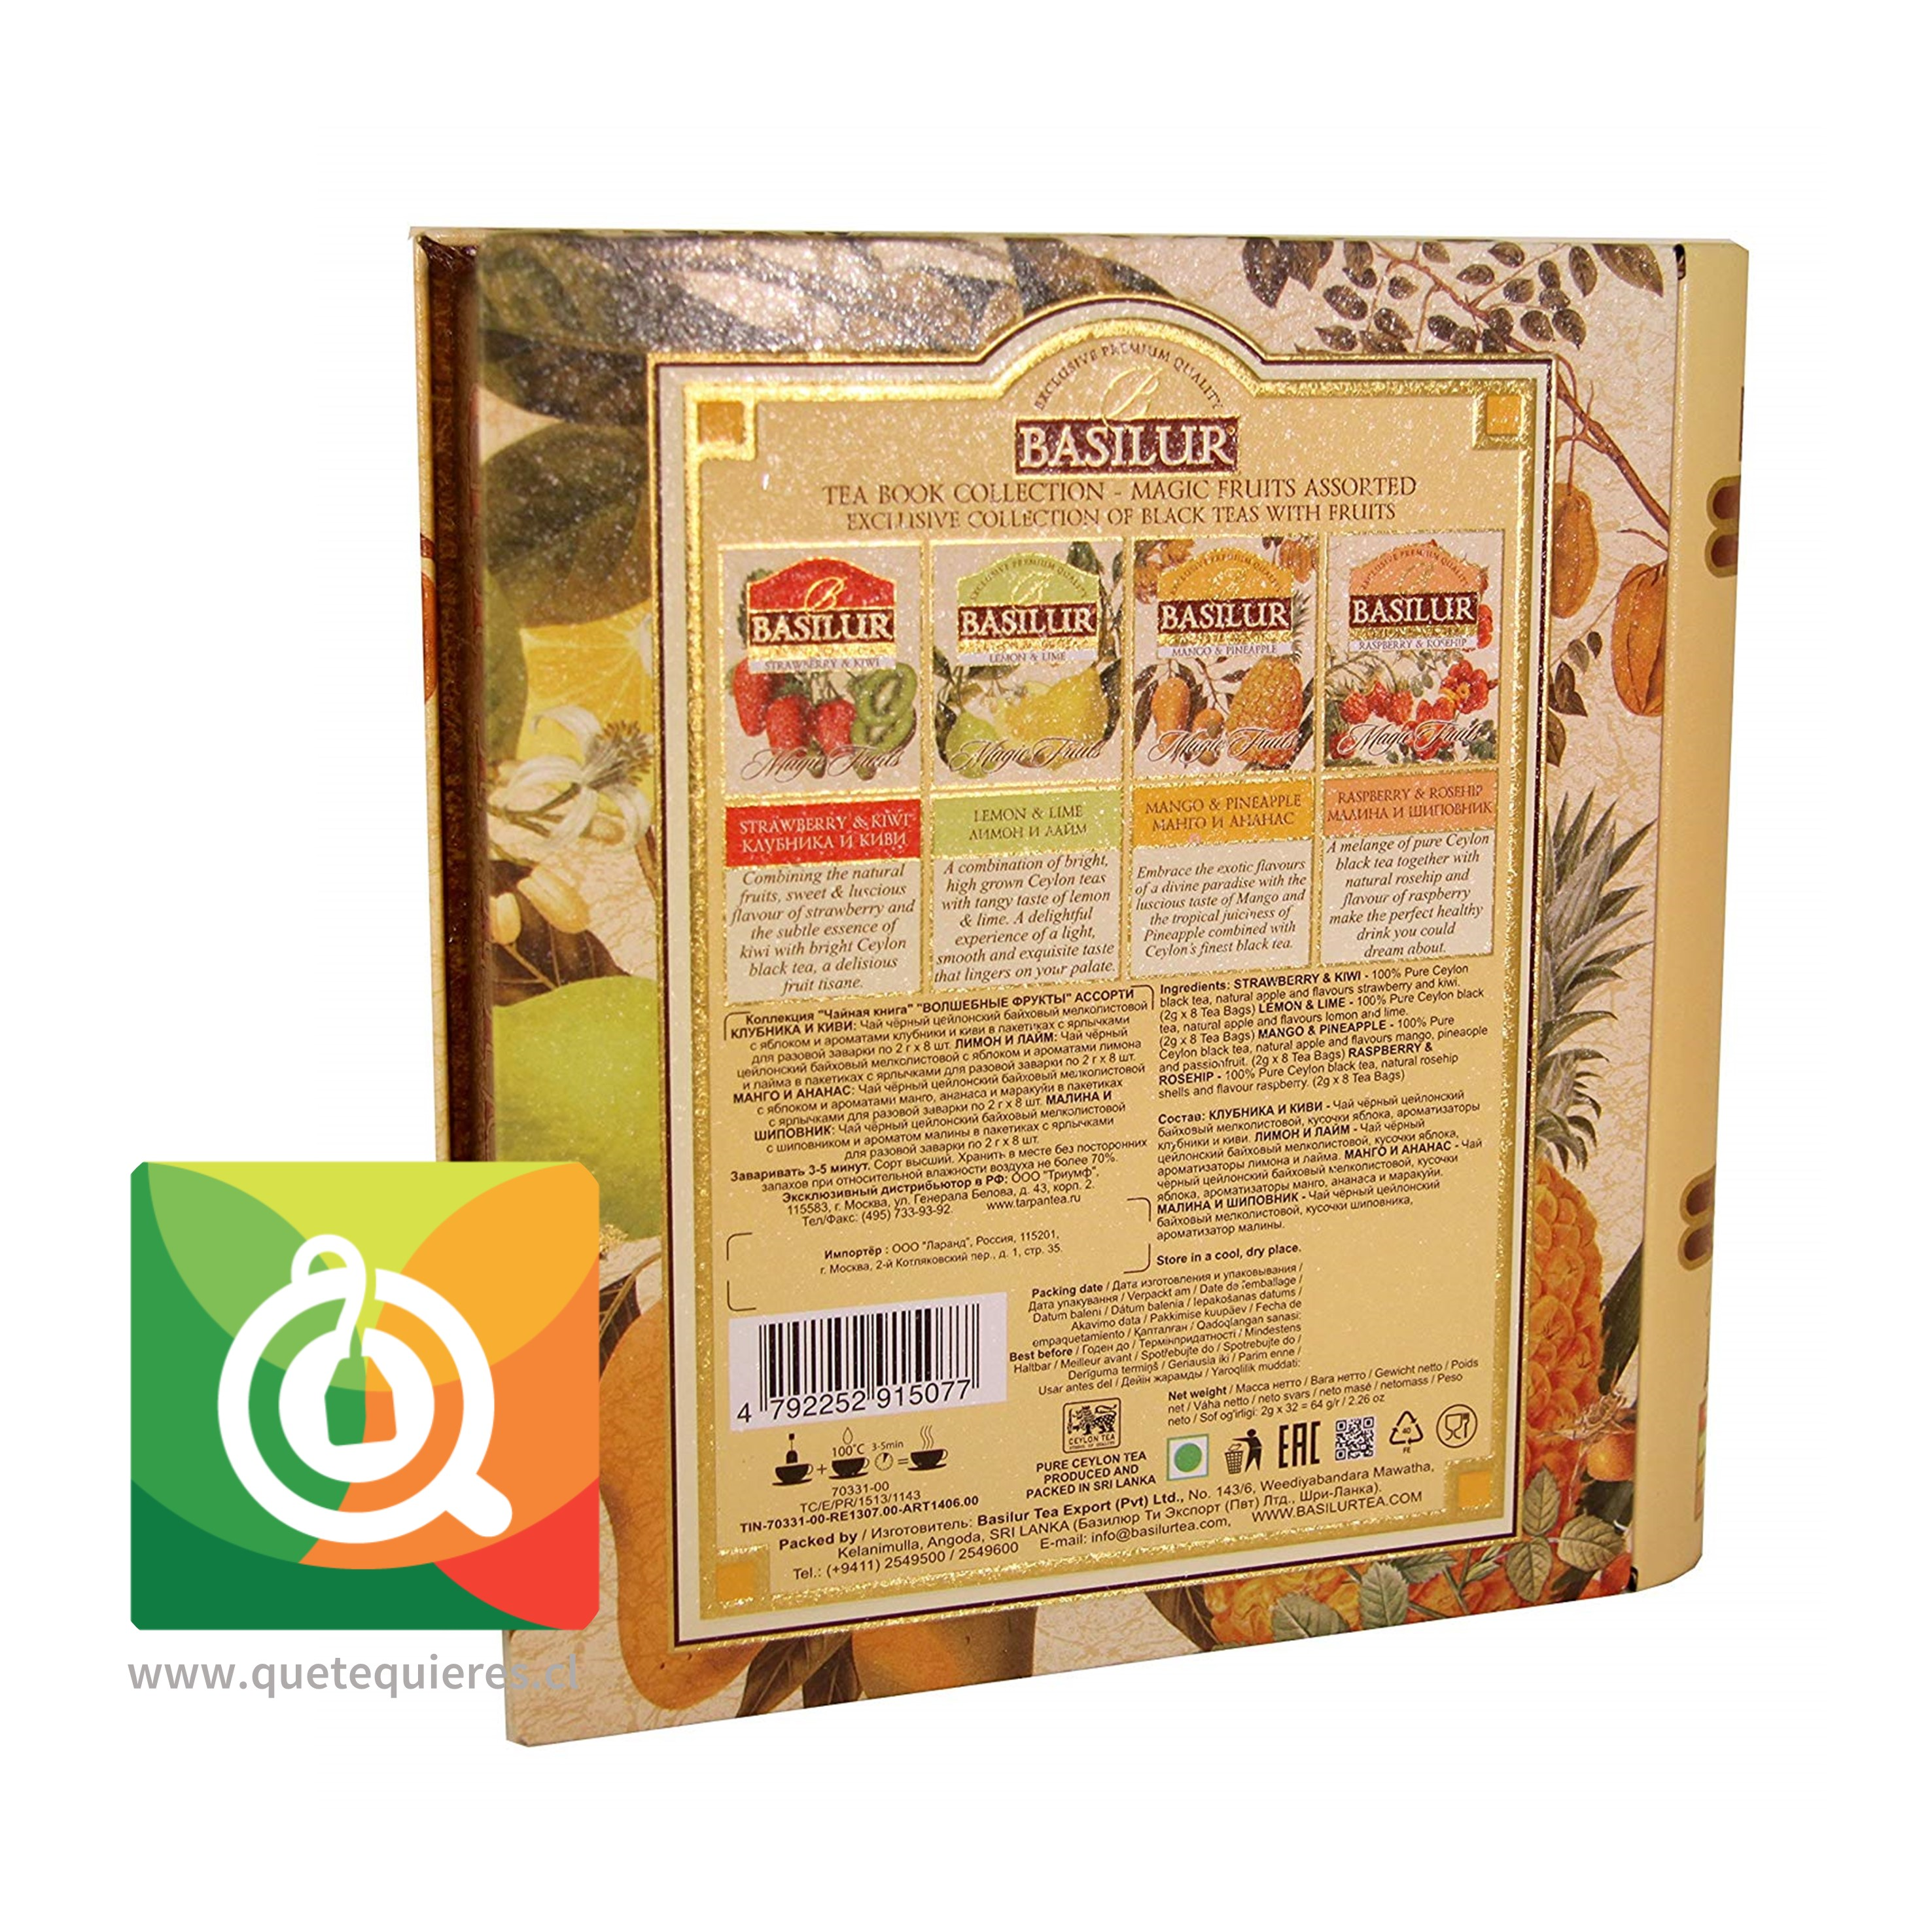 Basilur Libro Té Surtido Té Negro y Frutas - Magic Fruit Tea Book Assorted- Image 4